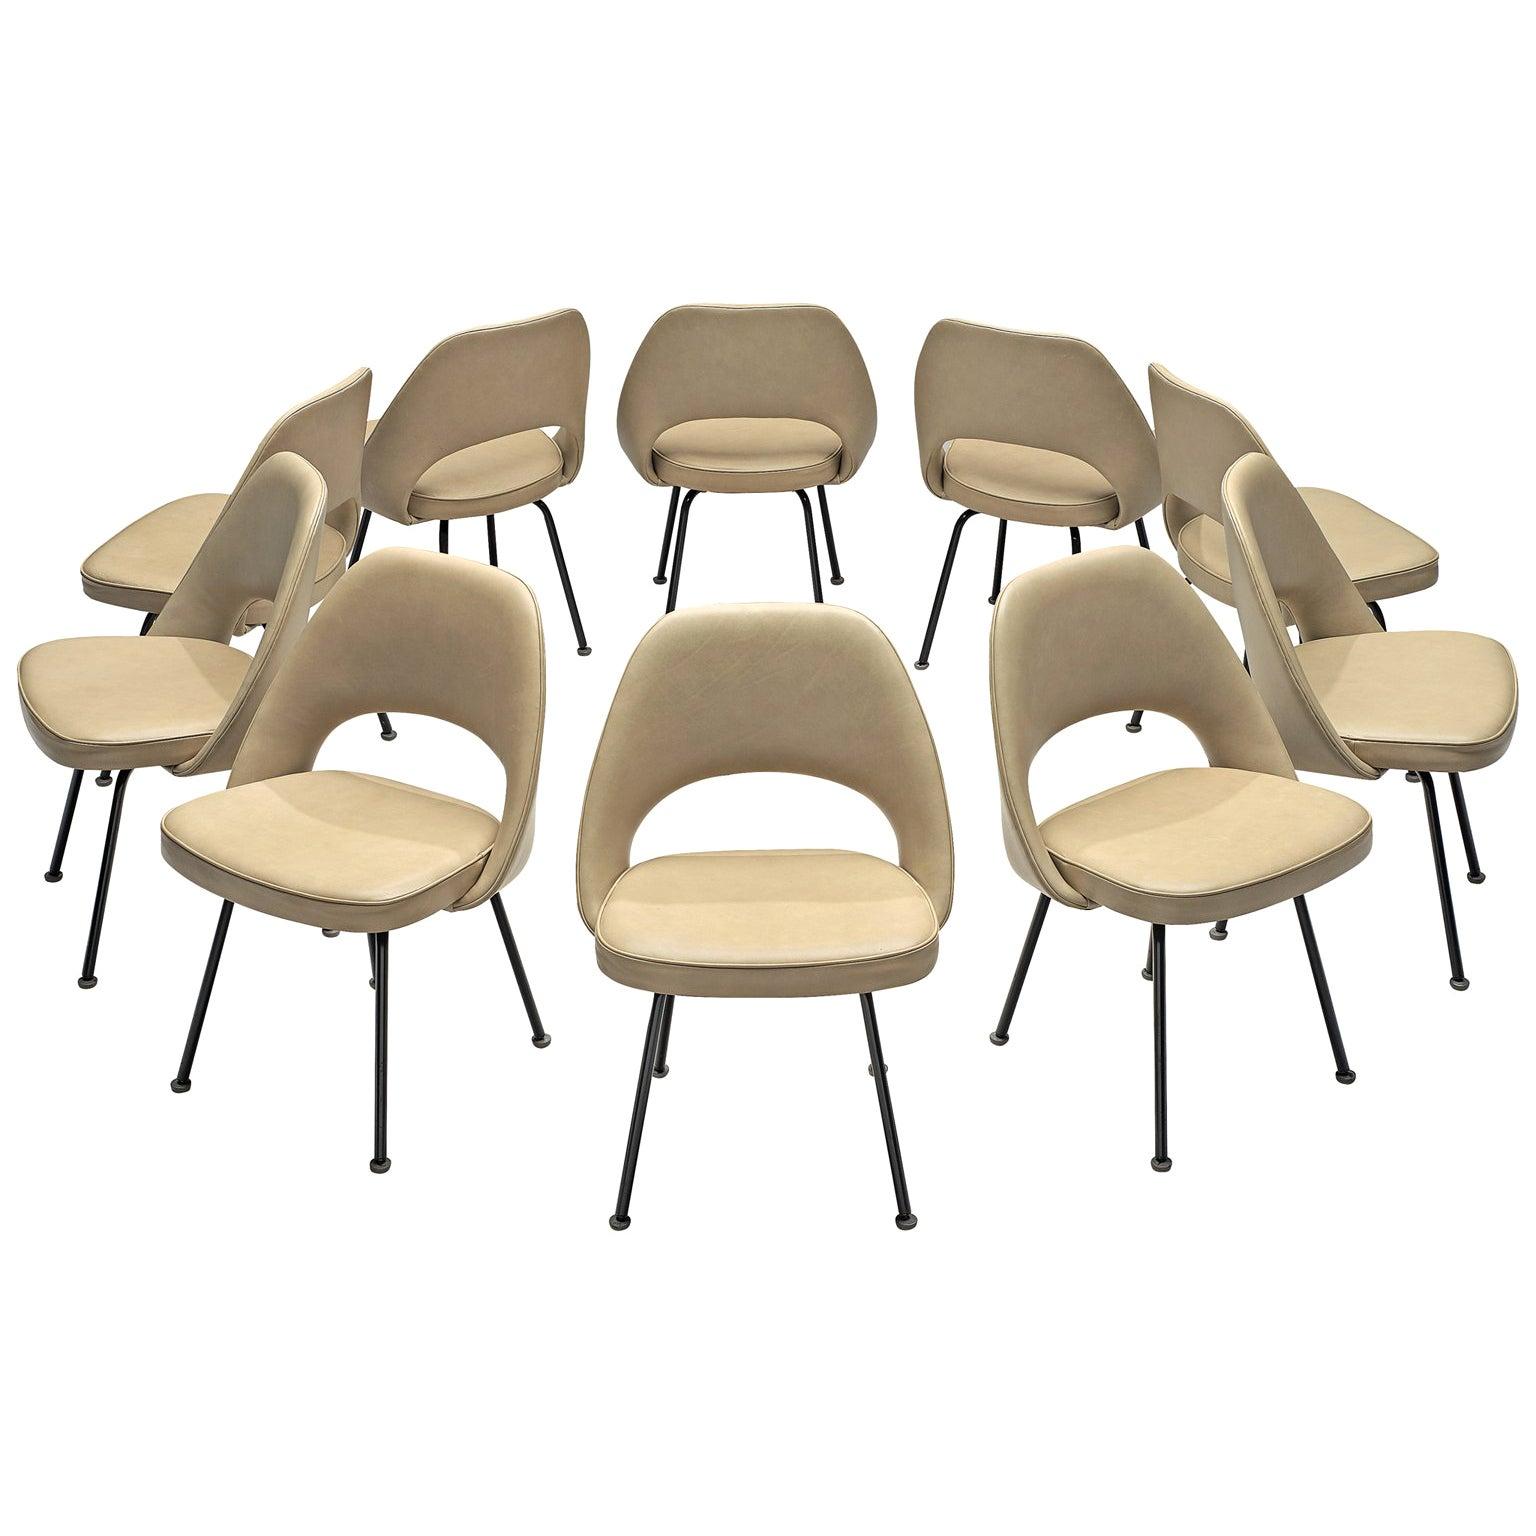 Eero Saarinen for Knoll International Reupholstered Chairs